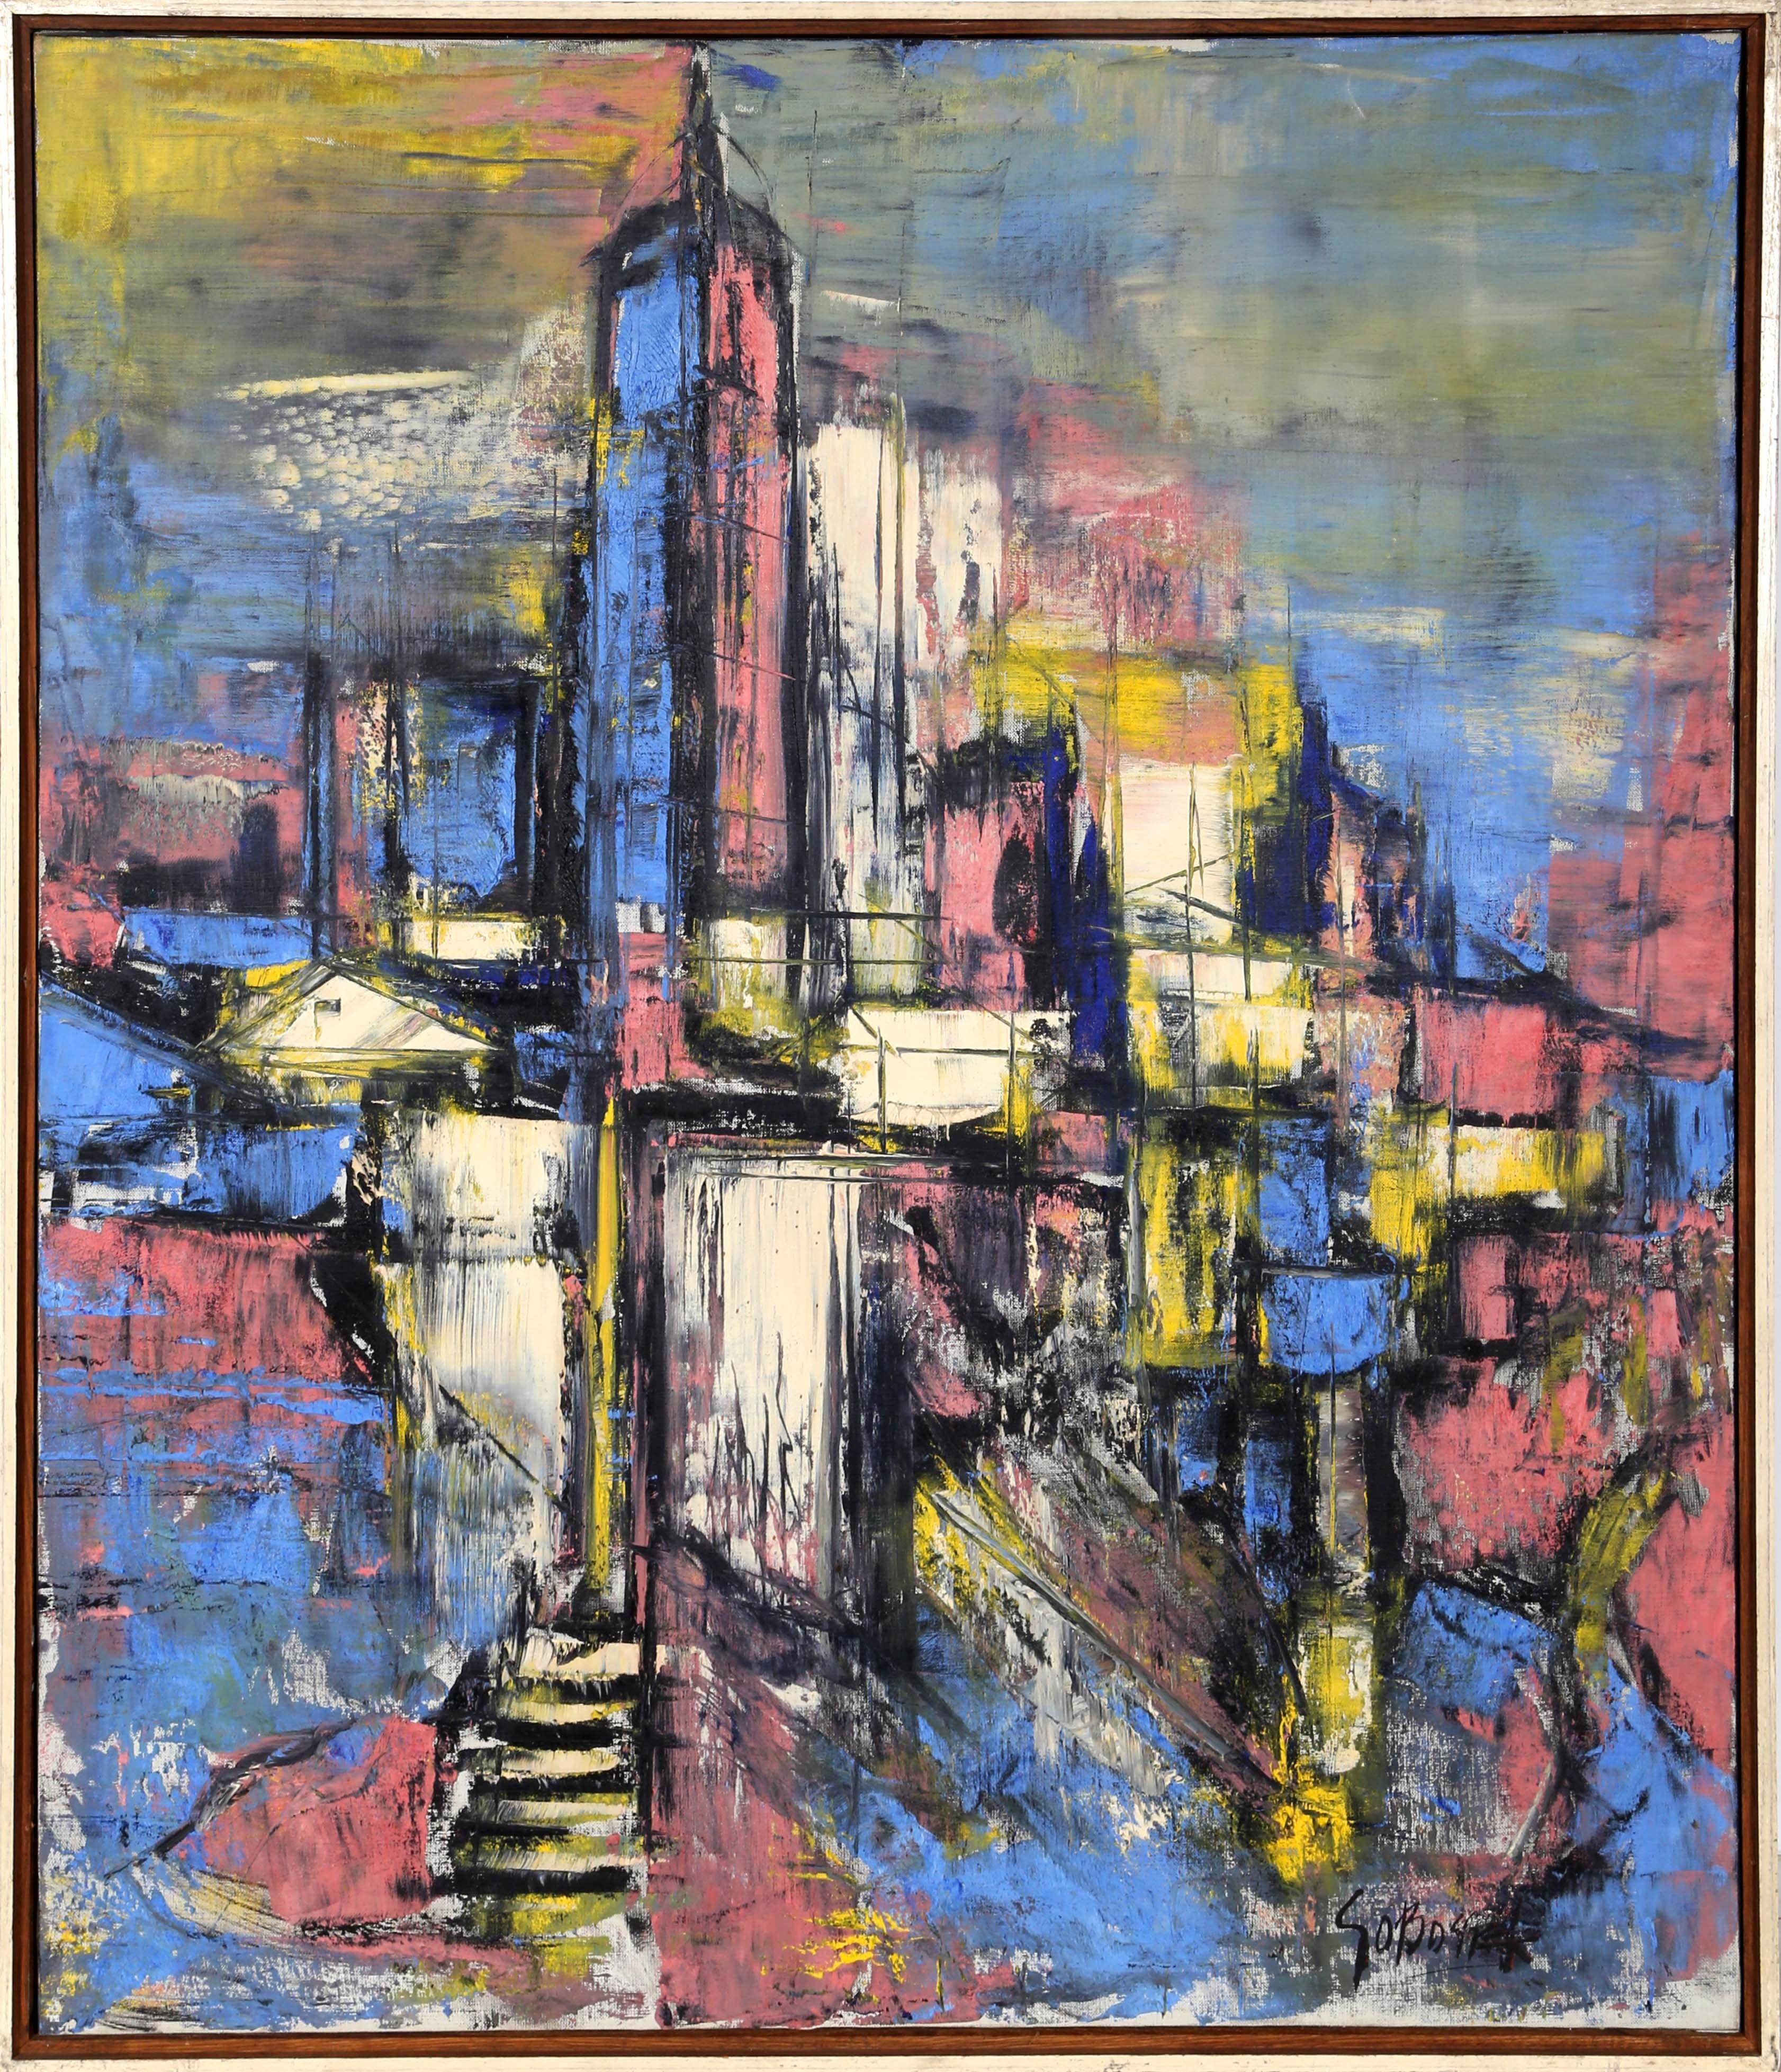 New York City, Oil Painting by Stanley Sobossek